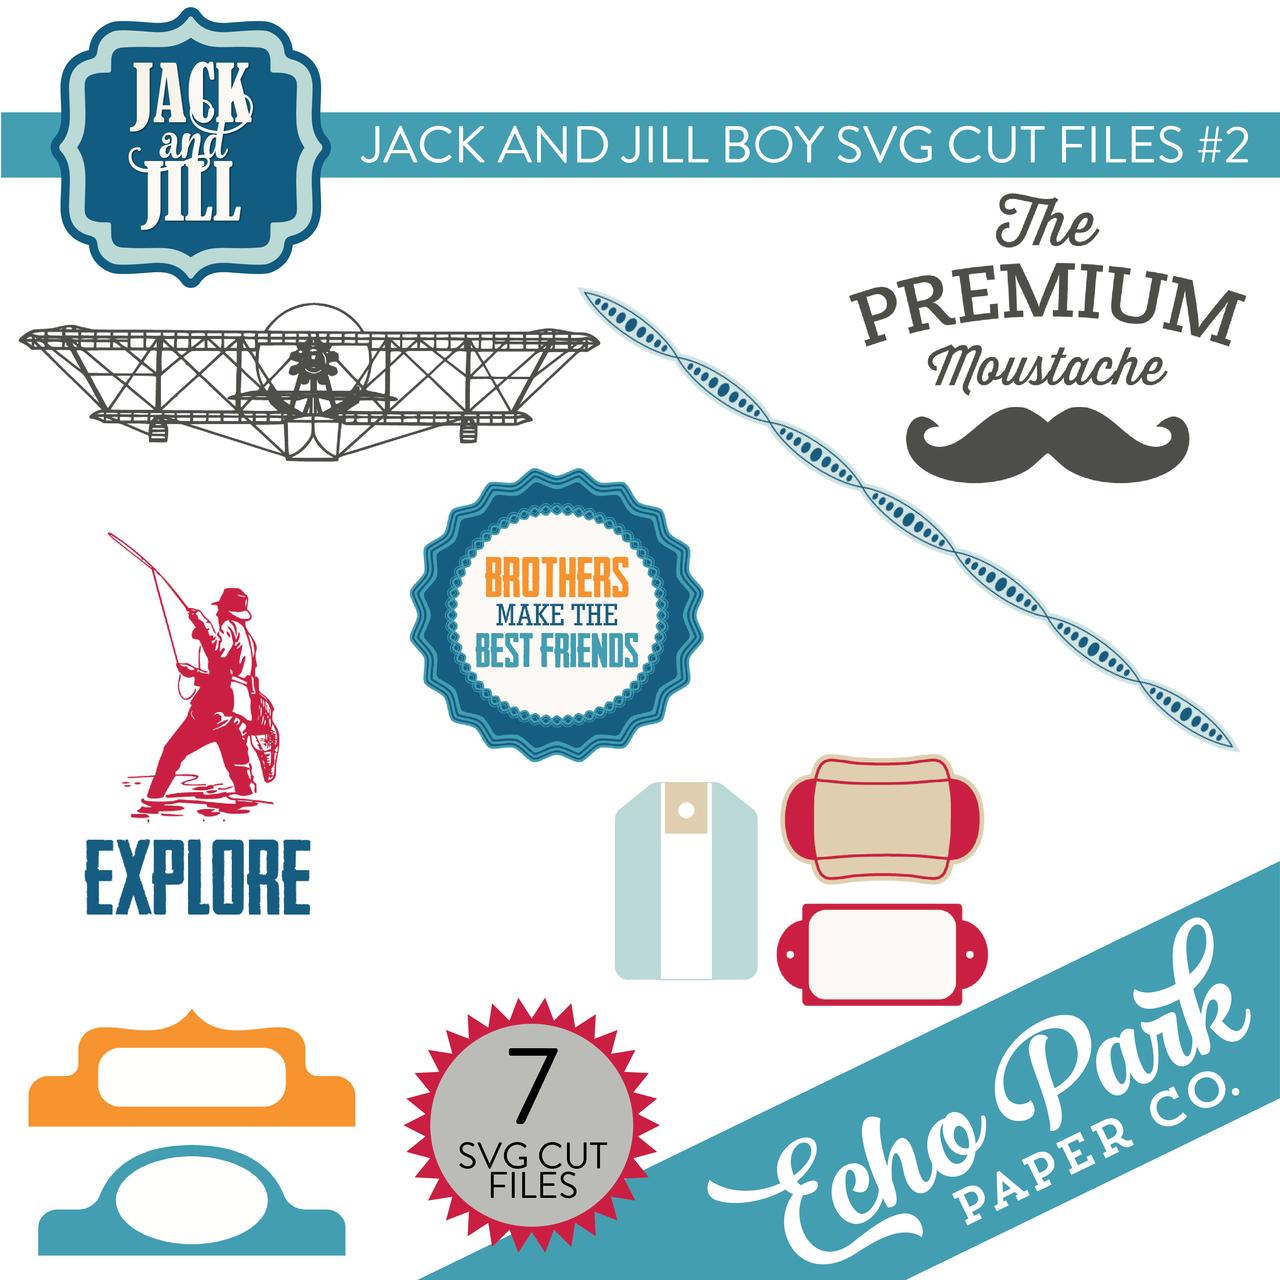 Jack and Jill - Boy SVG Cut Files #2